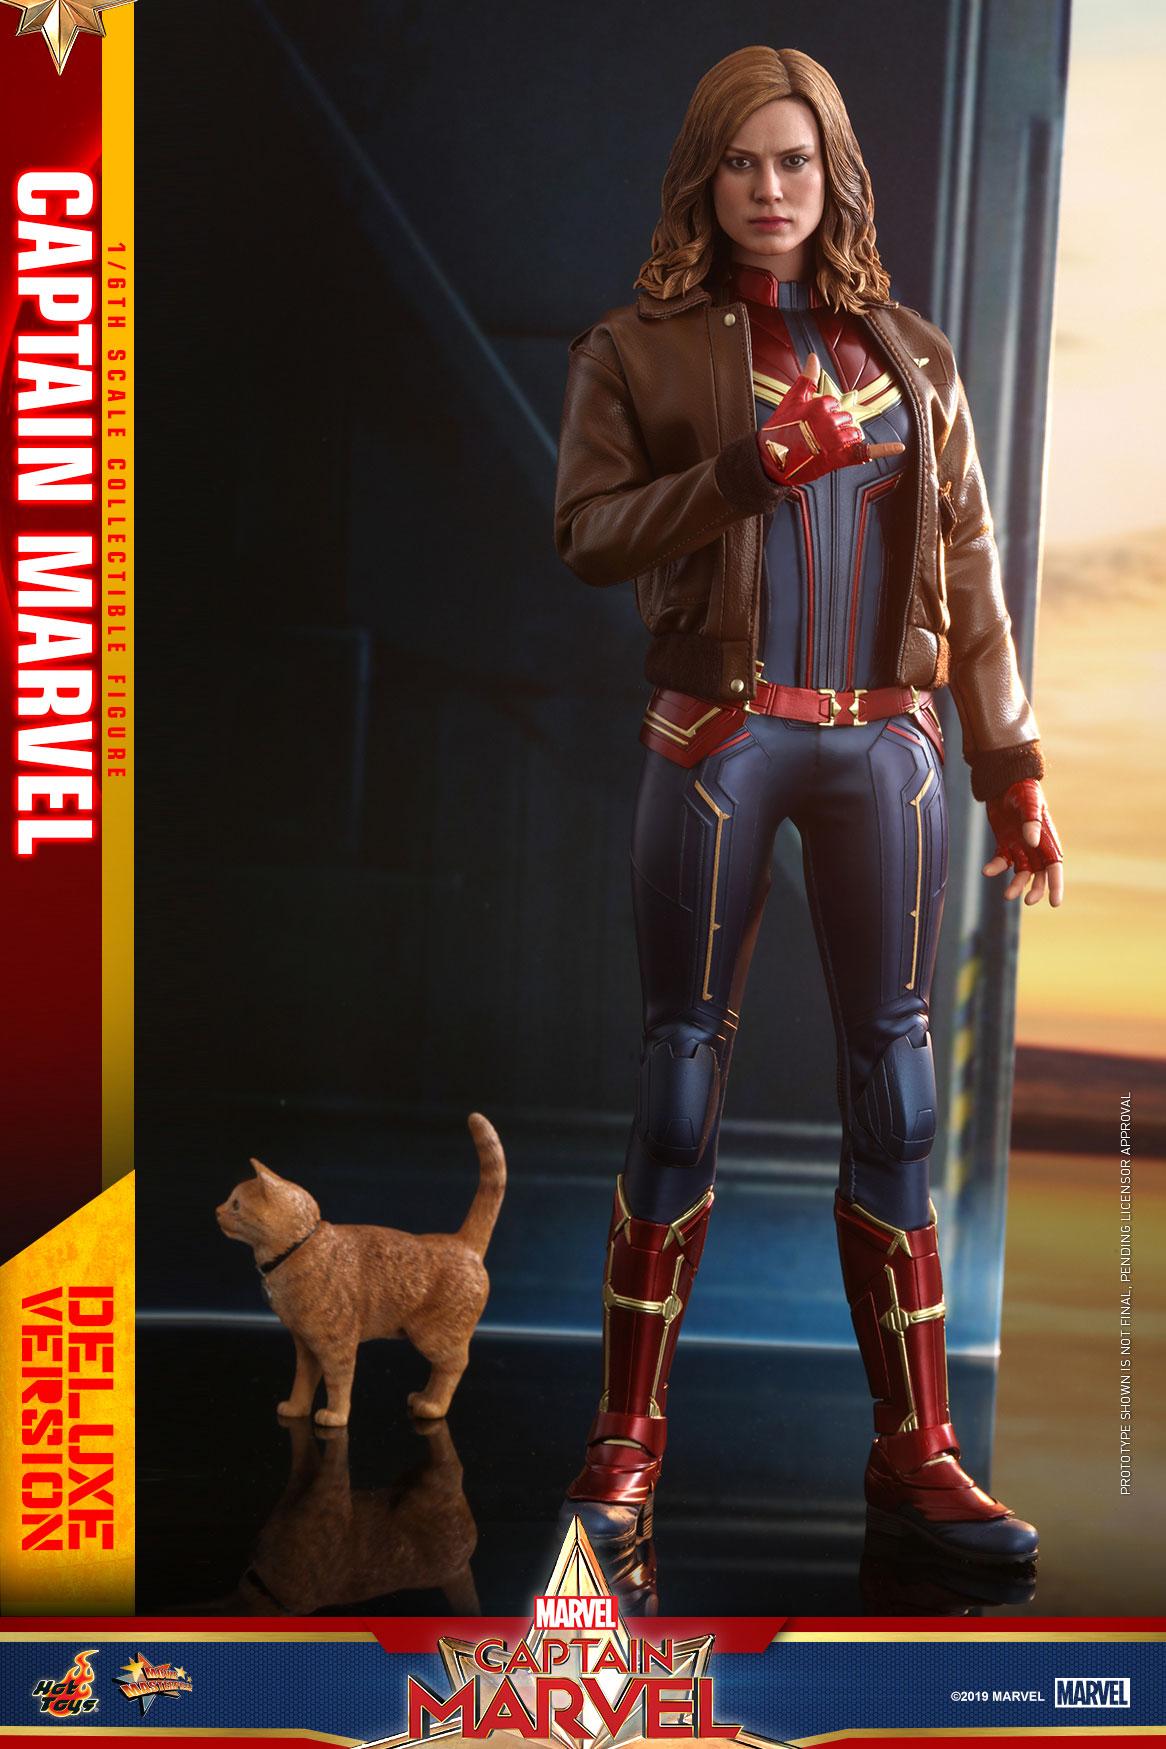 Hot-Toys---Captain-Marvel---Captain-Marvel-collectible-figure-(Deluxe)_PR9